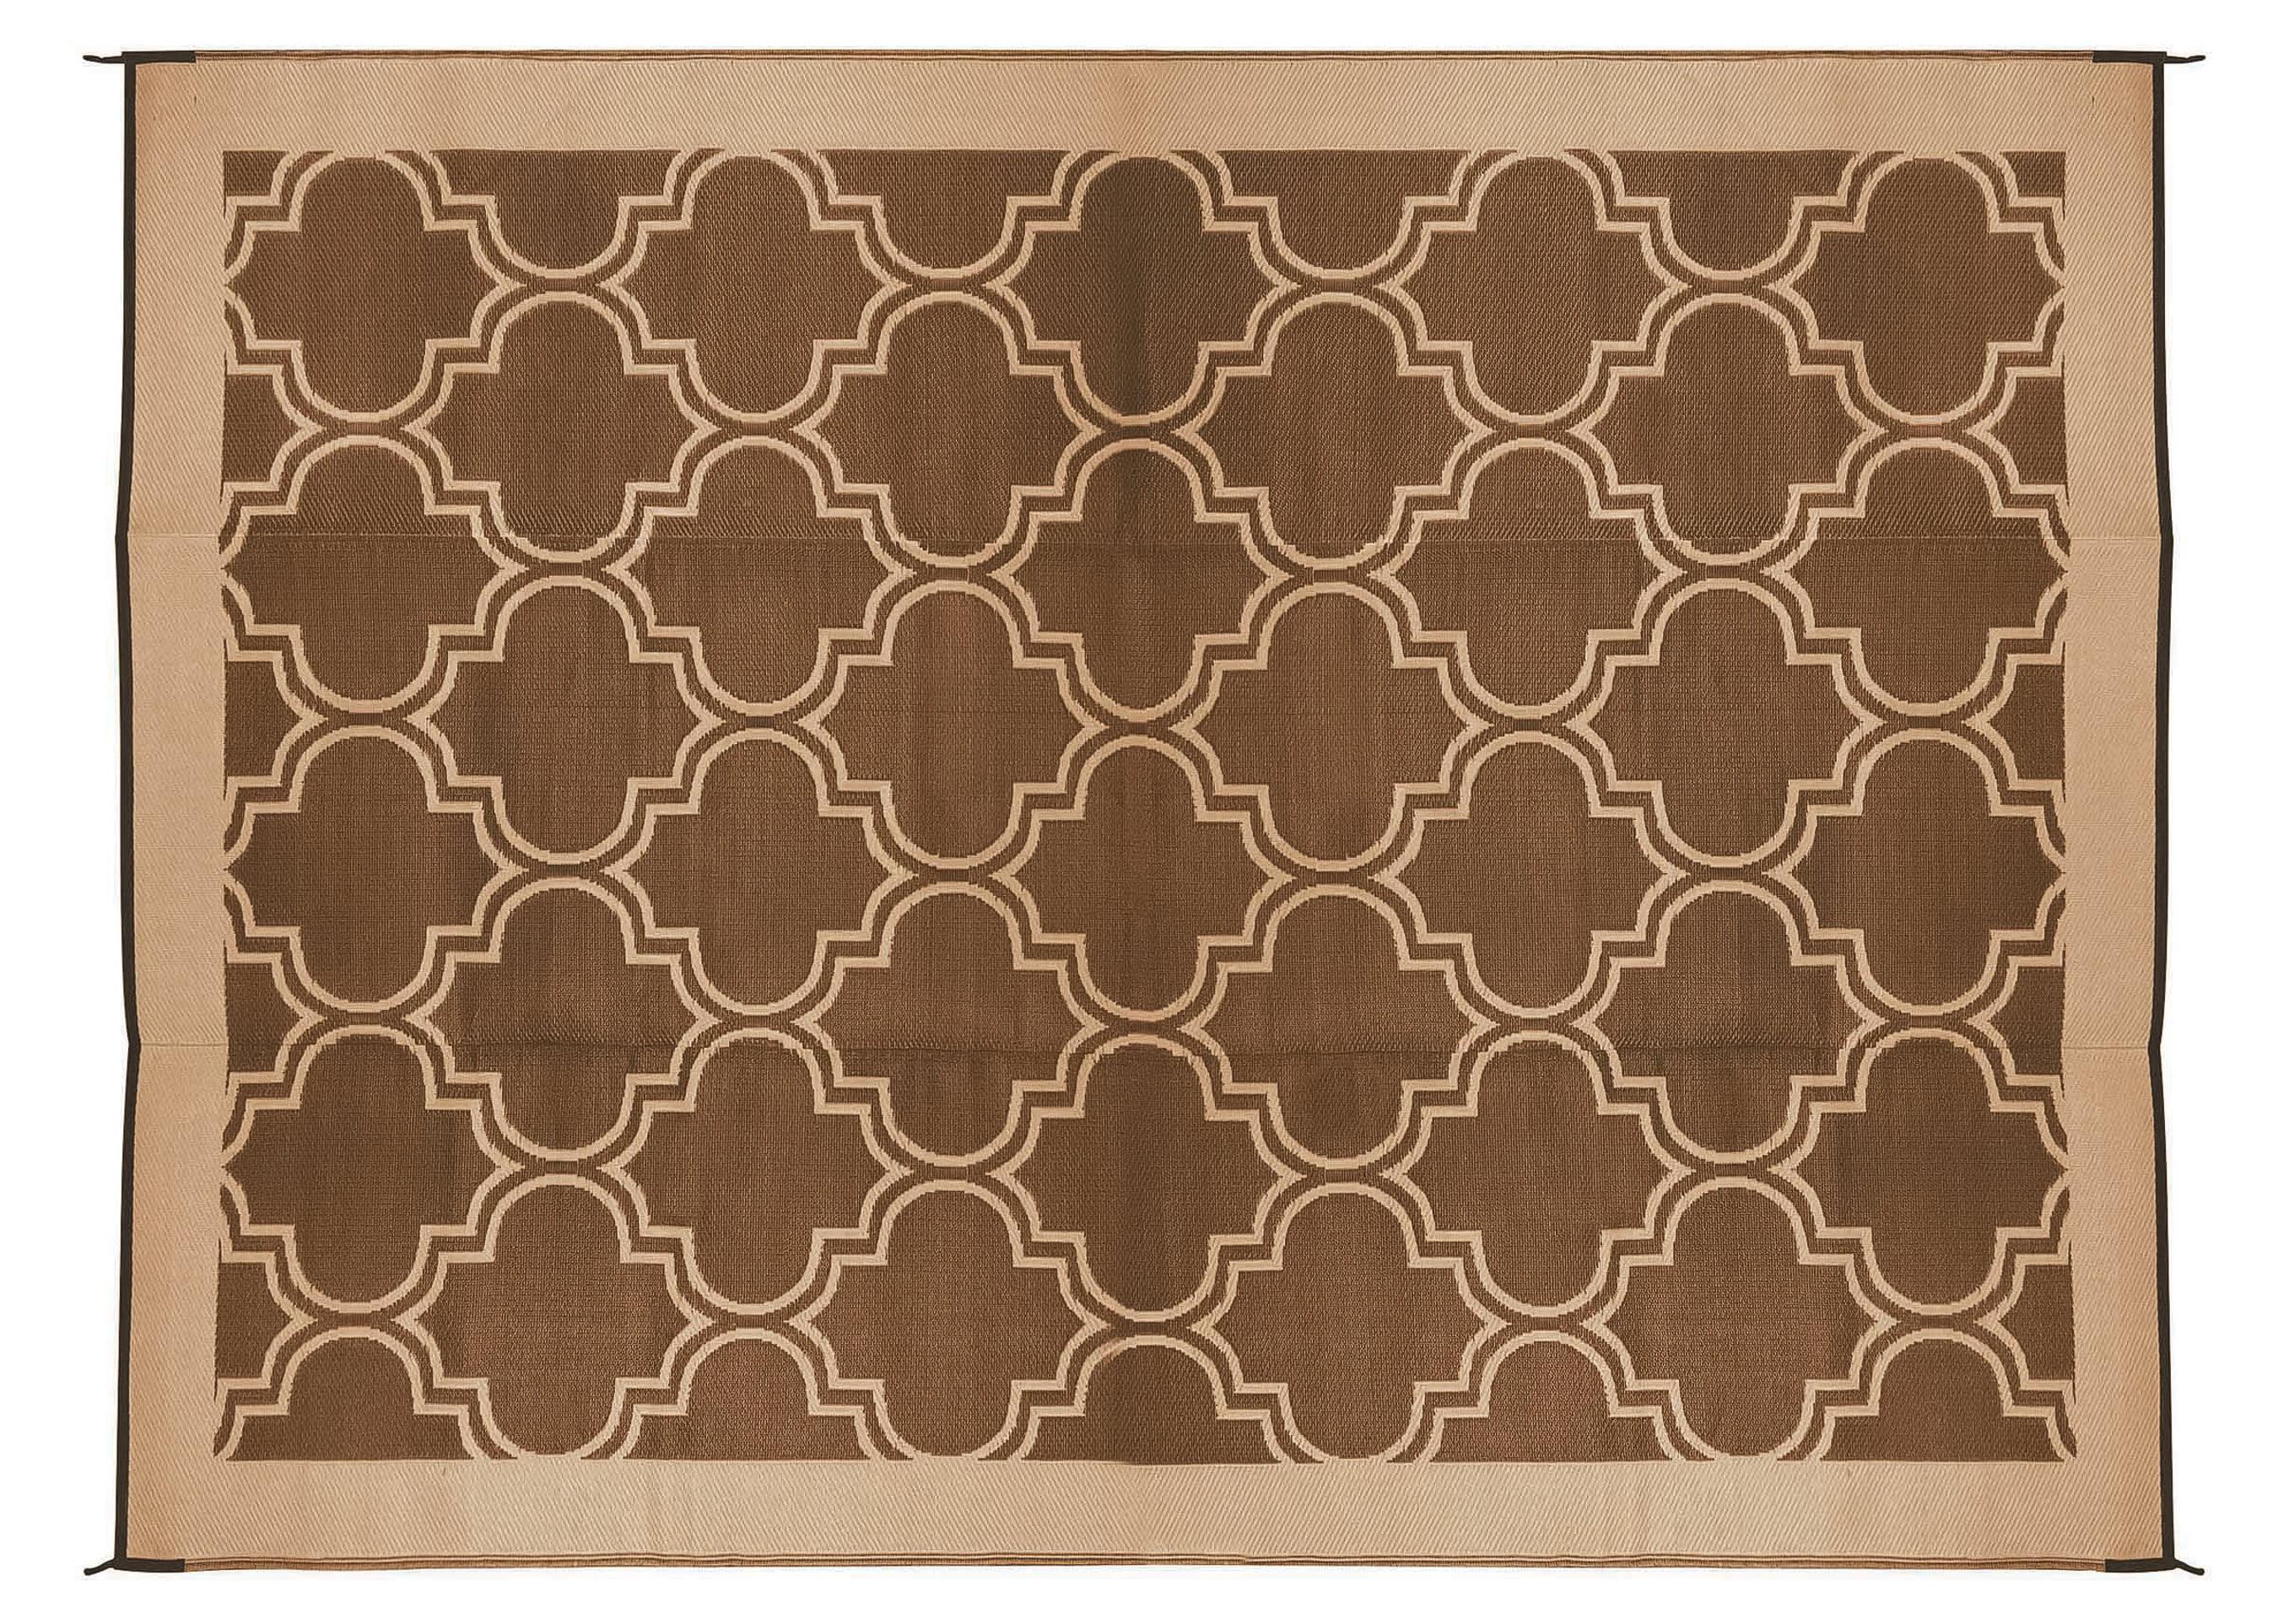 camco 42857 9 x 12 reversible rv outdoor mat brown tan lattice